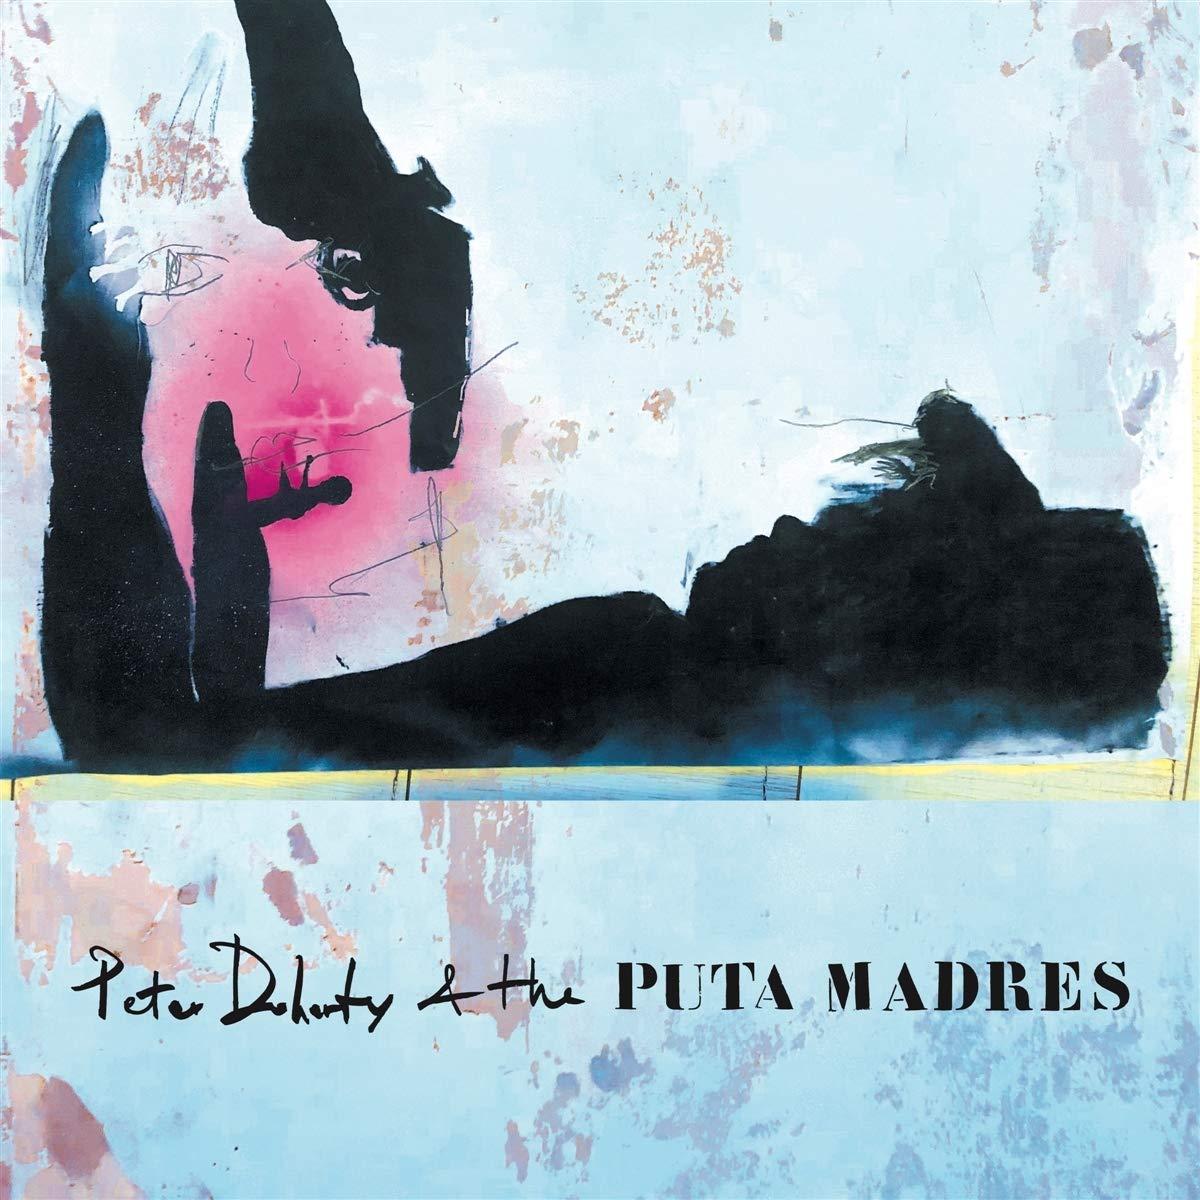 Peter Doherty & The Puta Madres – Peter Doherty & The Puta Madres (2019) [FLAC]